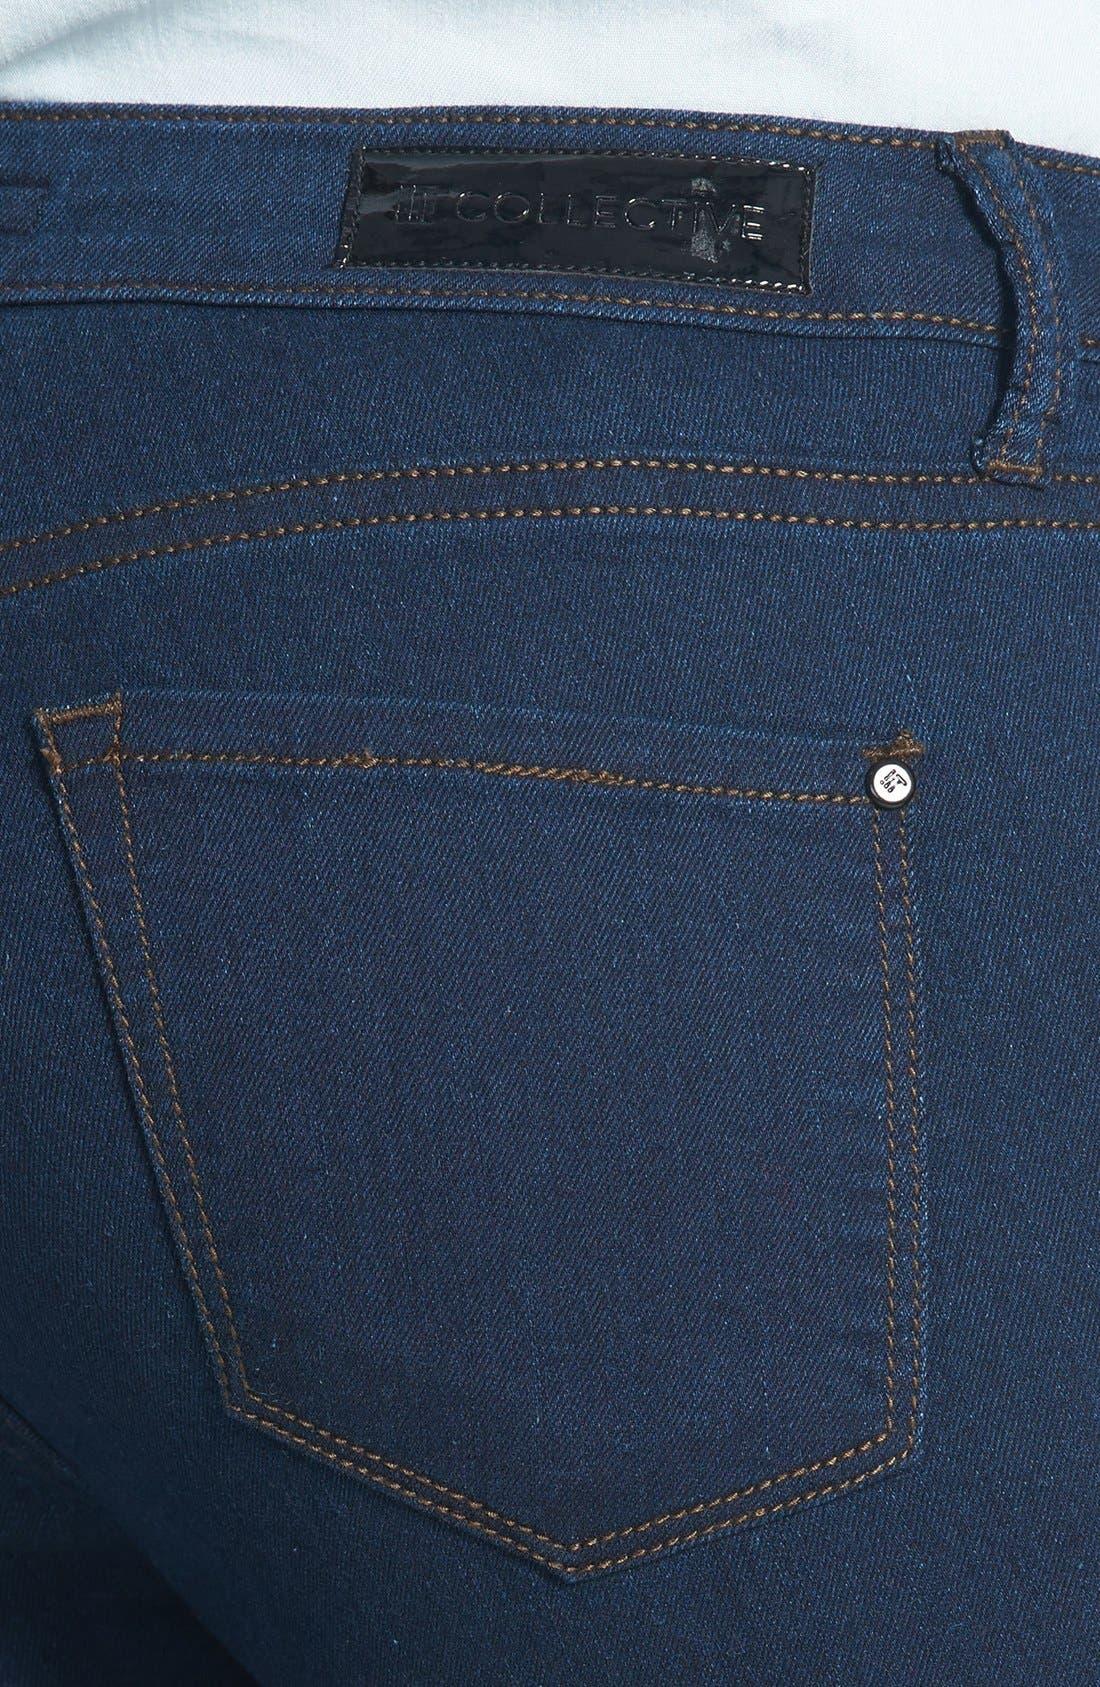 Alternate Image 3  - !iT Collective 'Lola' Stretch Ultra Skinny Jeans (Regular & Petite)